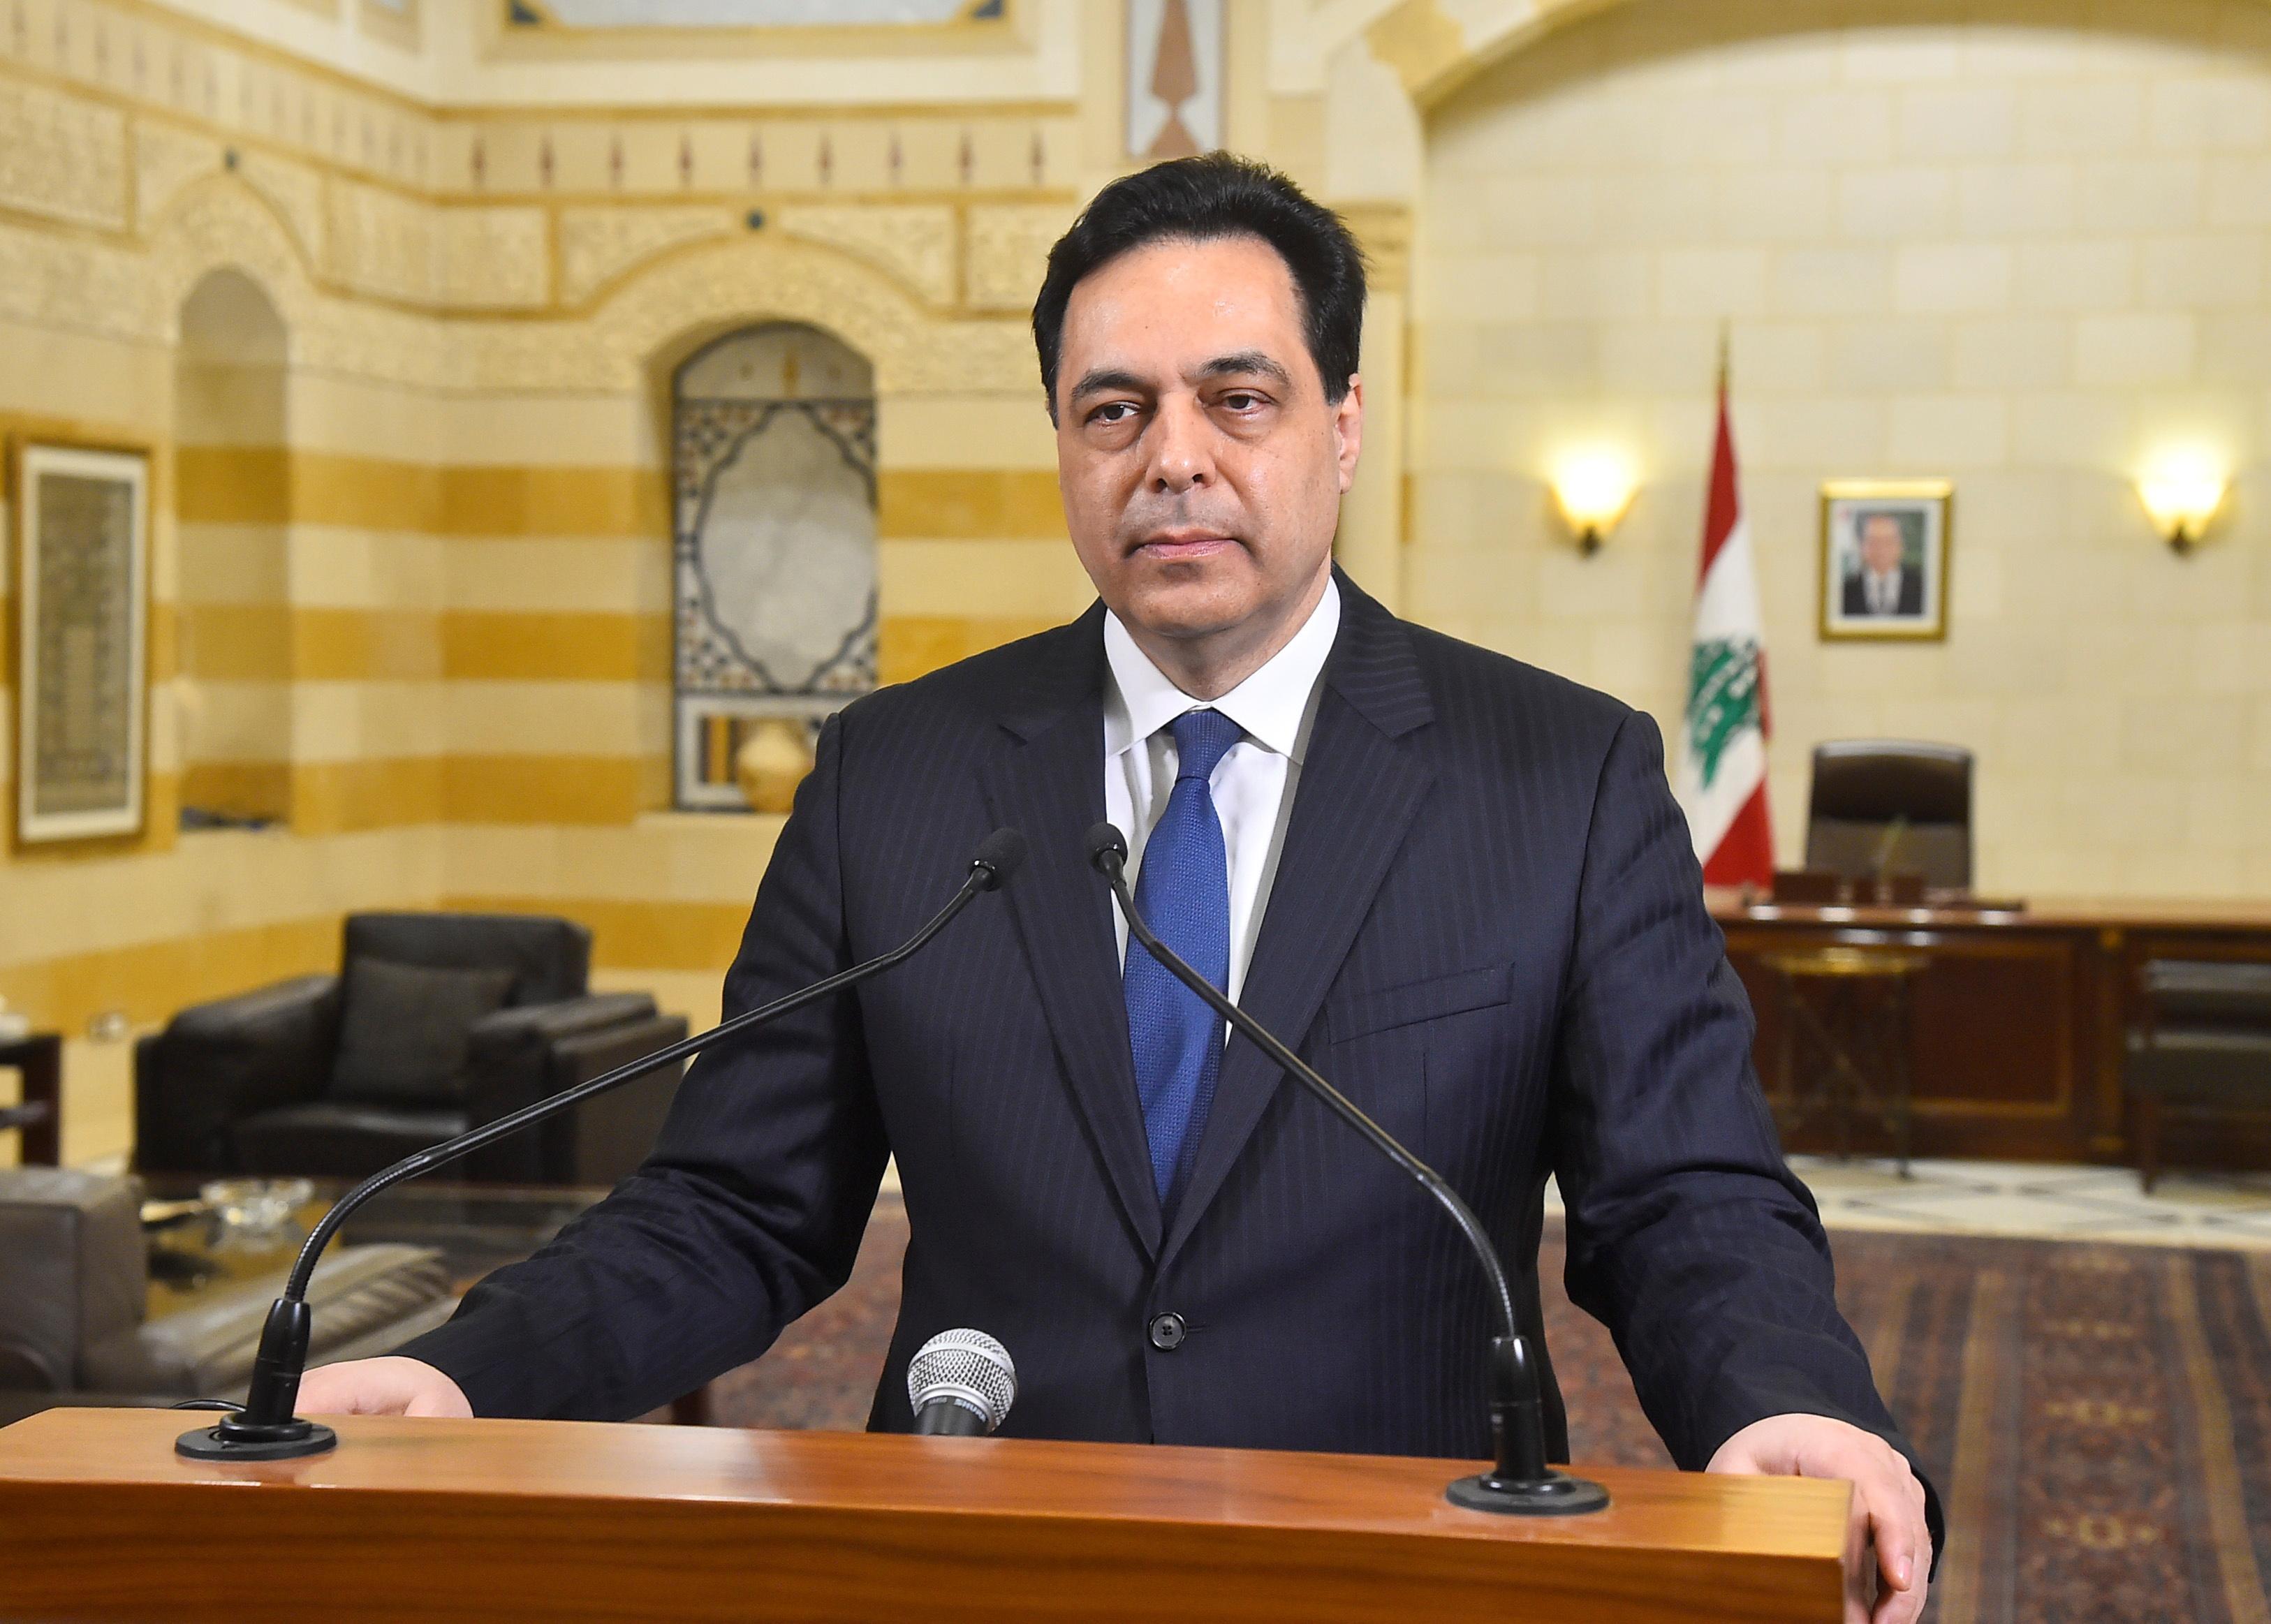 Lebanon's caretaker Prime Minister Hassan Diab speaks at the government palace in Beirut, Lebanon March 6, 2021. Dalati Nohra/Handout via REUTERS